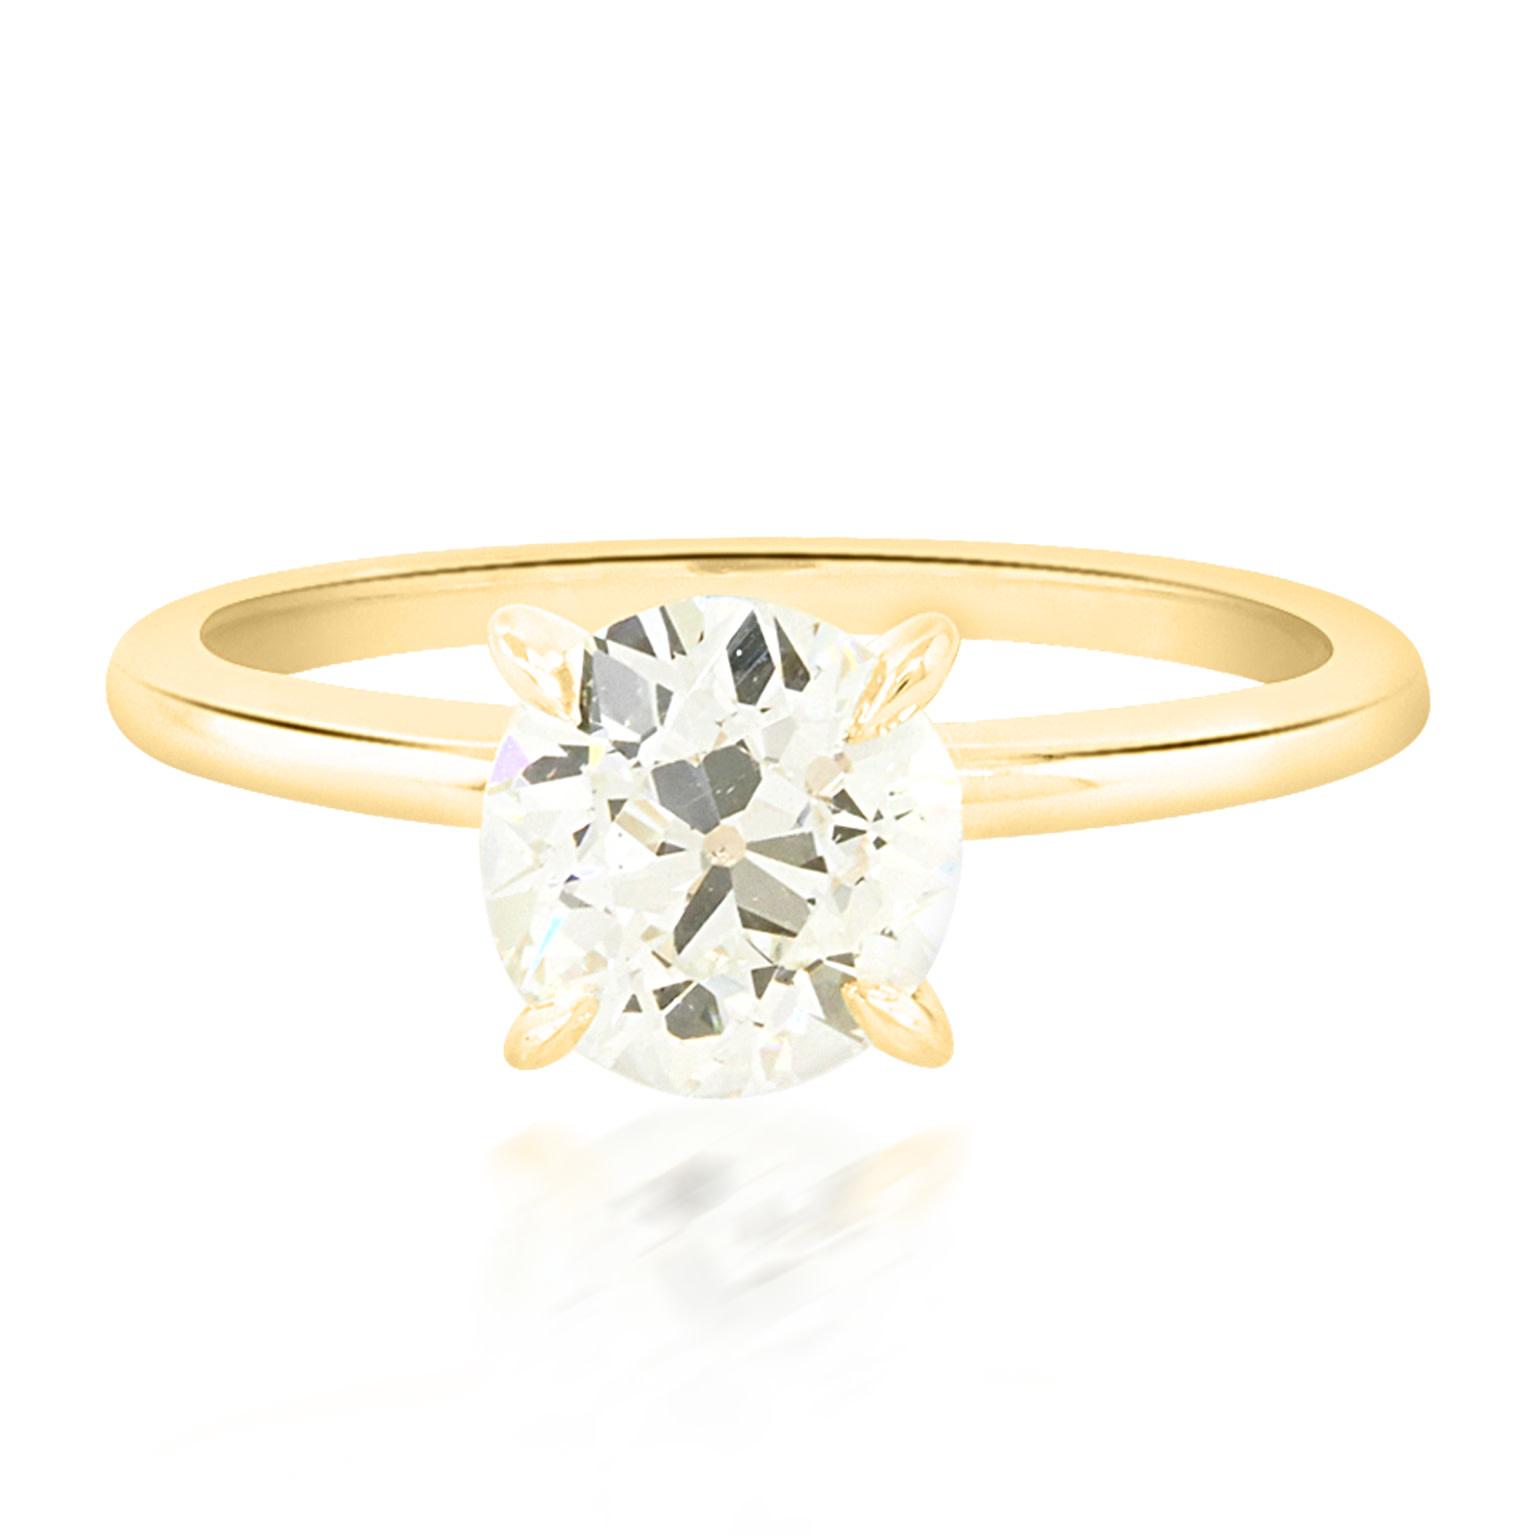 Trabert Goldsmiths 1.36ct KVS2 Old European Cut Diamond Ring